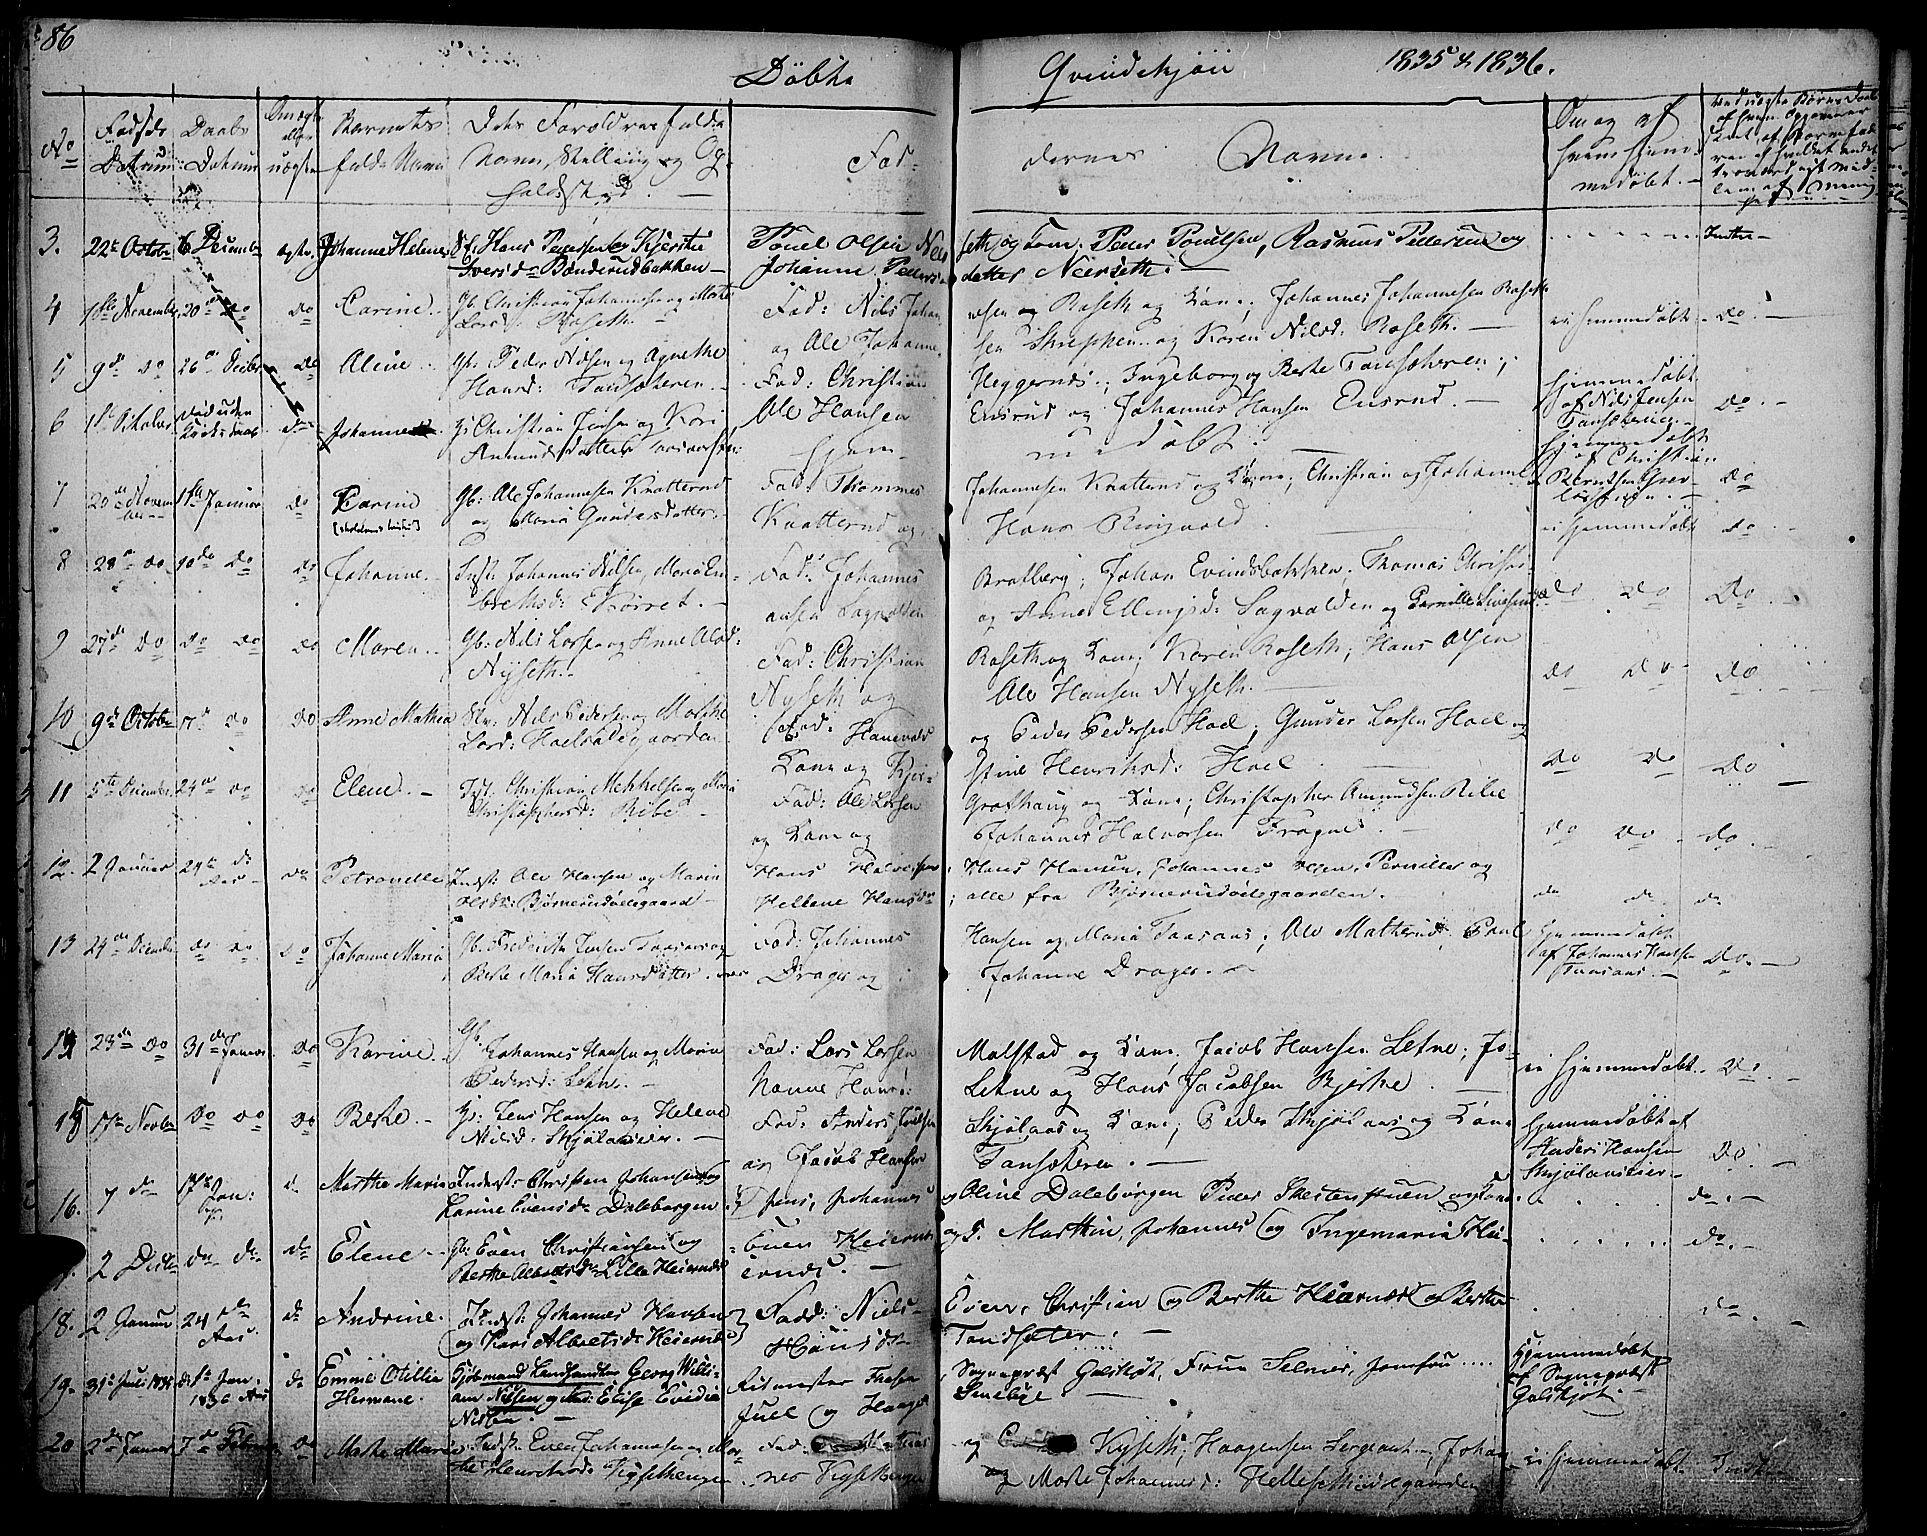 SAH, Vestre Toten prestekontor, H/Ha/Haa/L0002: Ministerialbok nr. 2, 1825-1837, s. 86